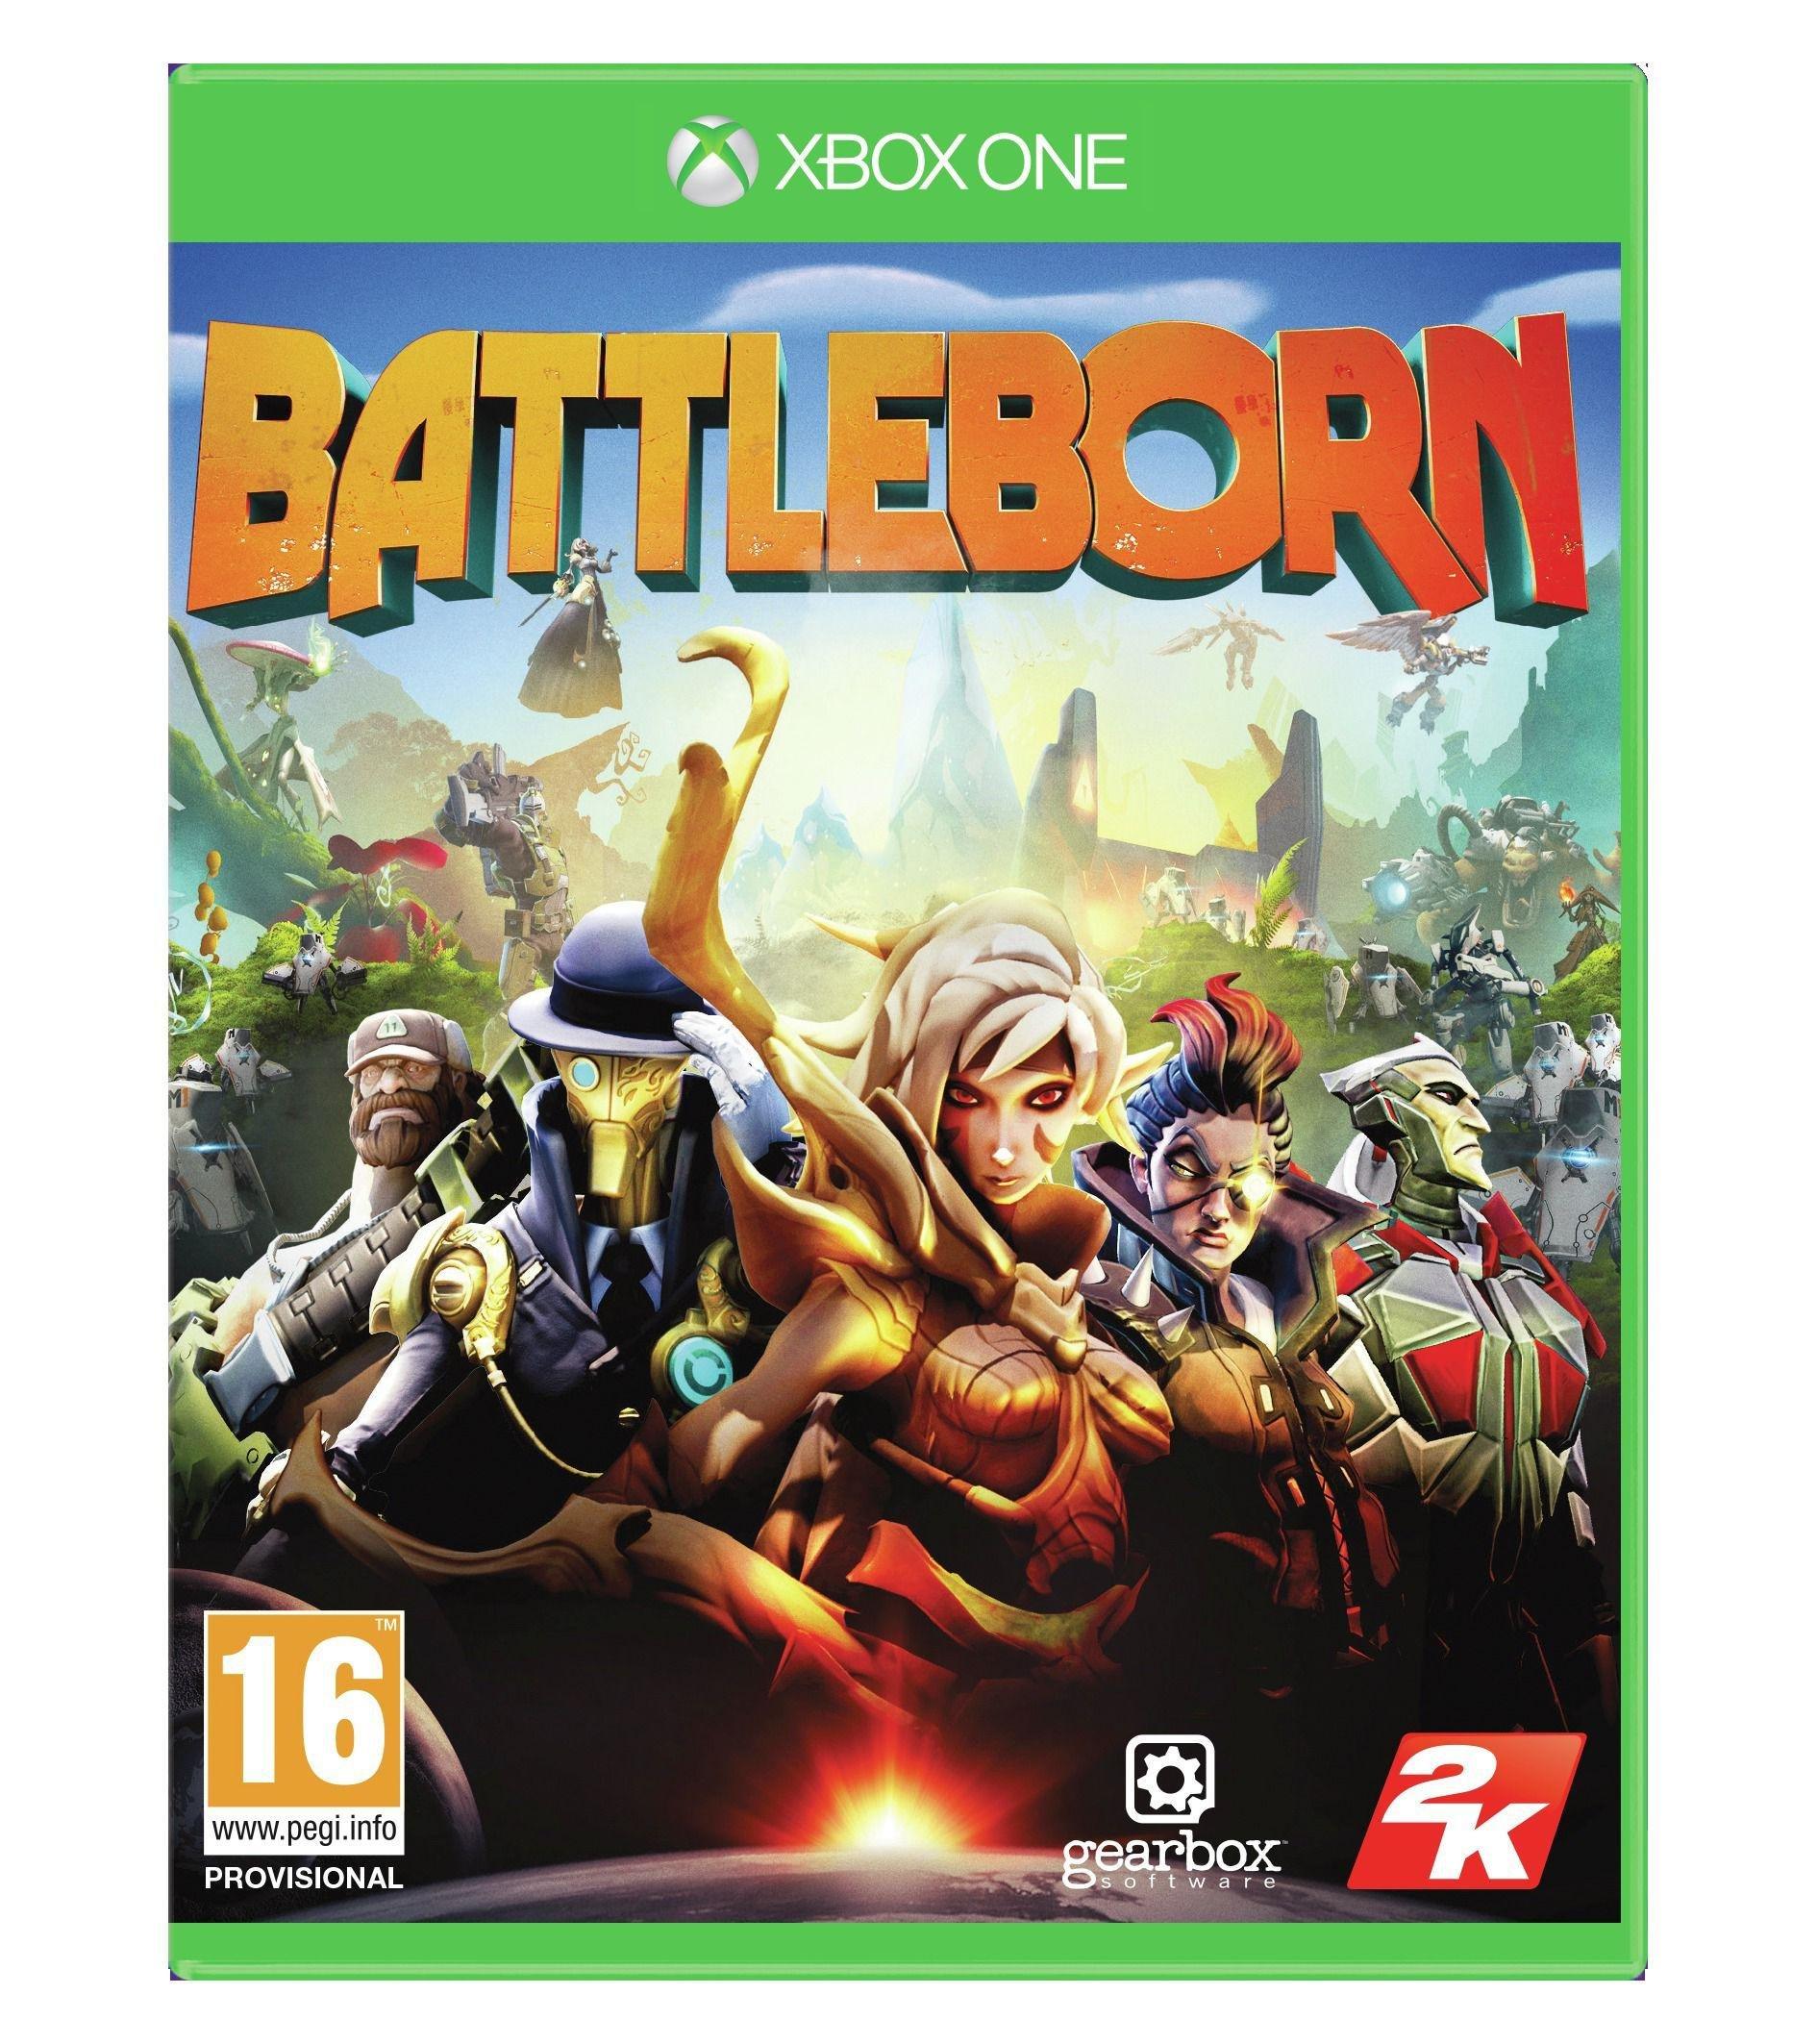 Image of Battleborn - Xbox - One Game.